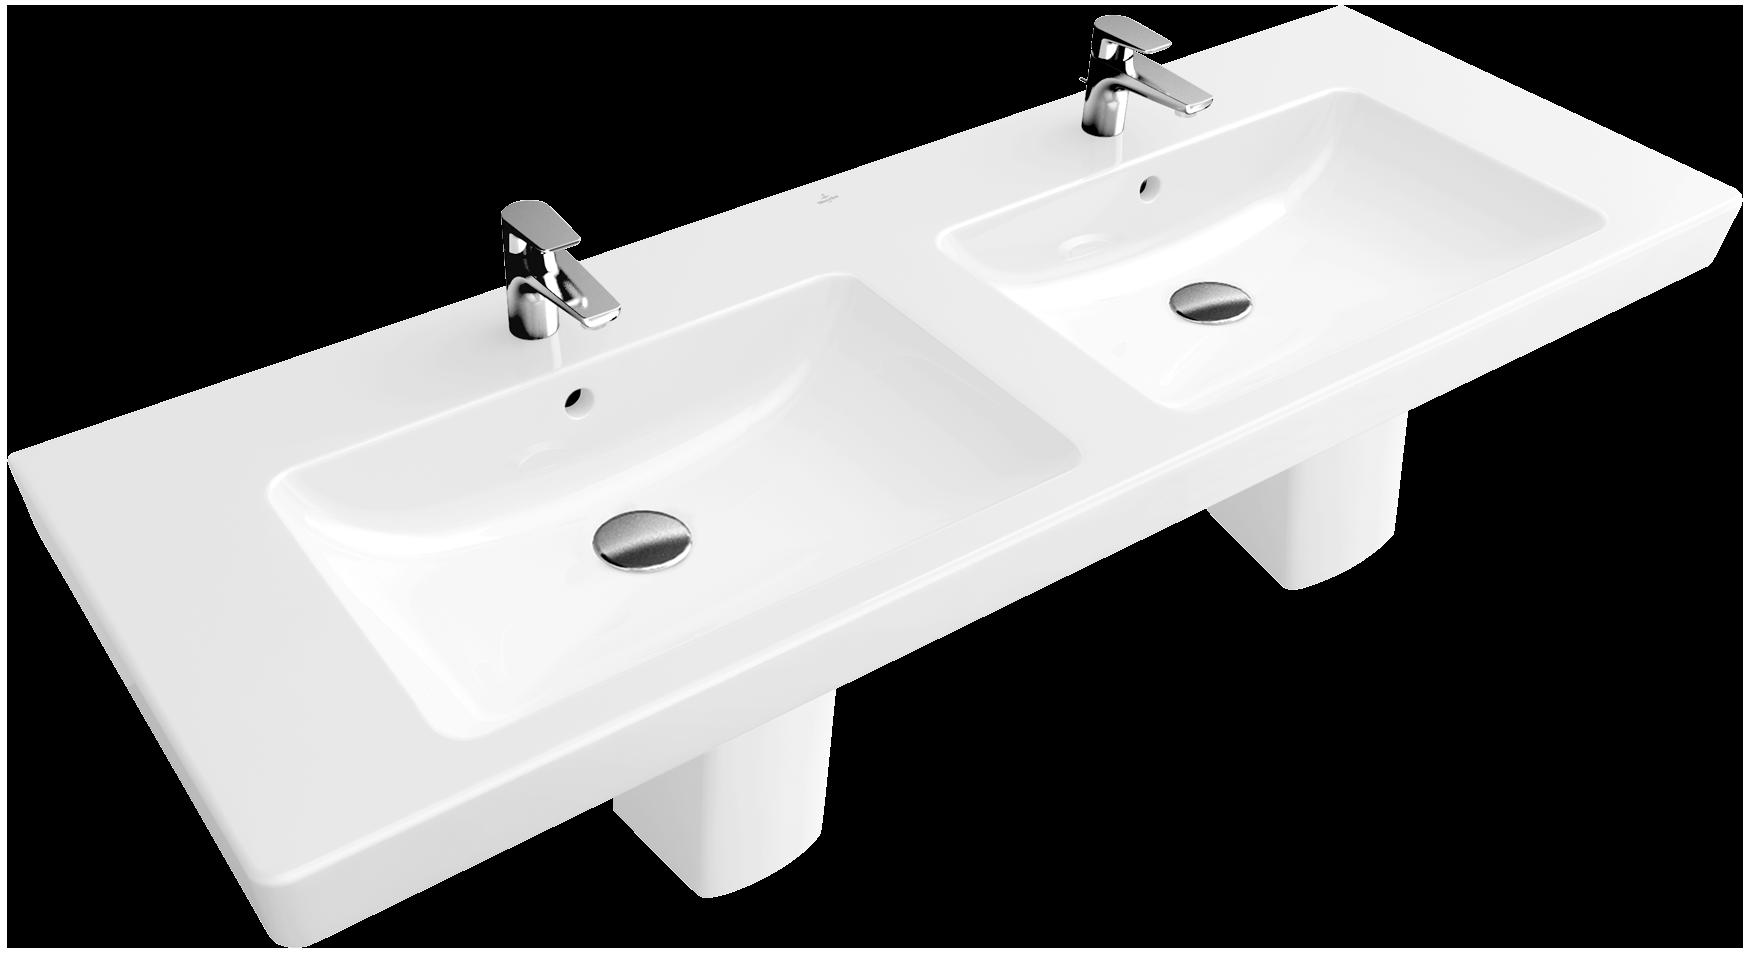 subway double vanity washbasin 51 angular 7175u4. Black Bedroom Furniture Sets. Home Design Ideas